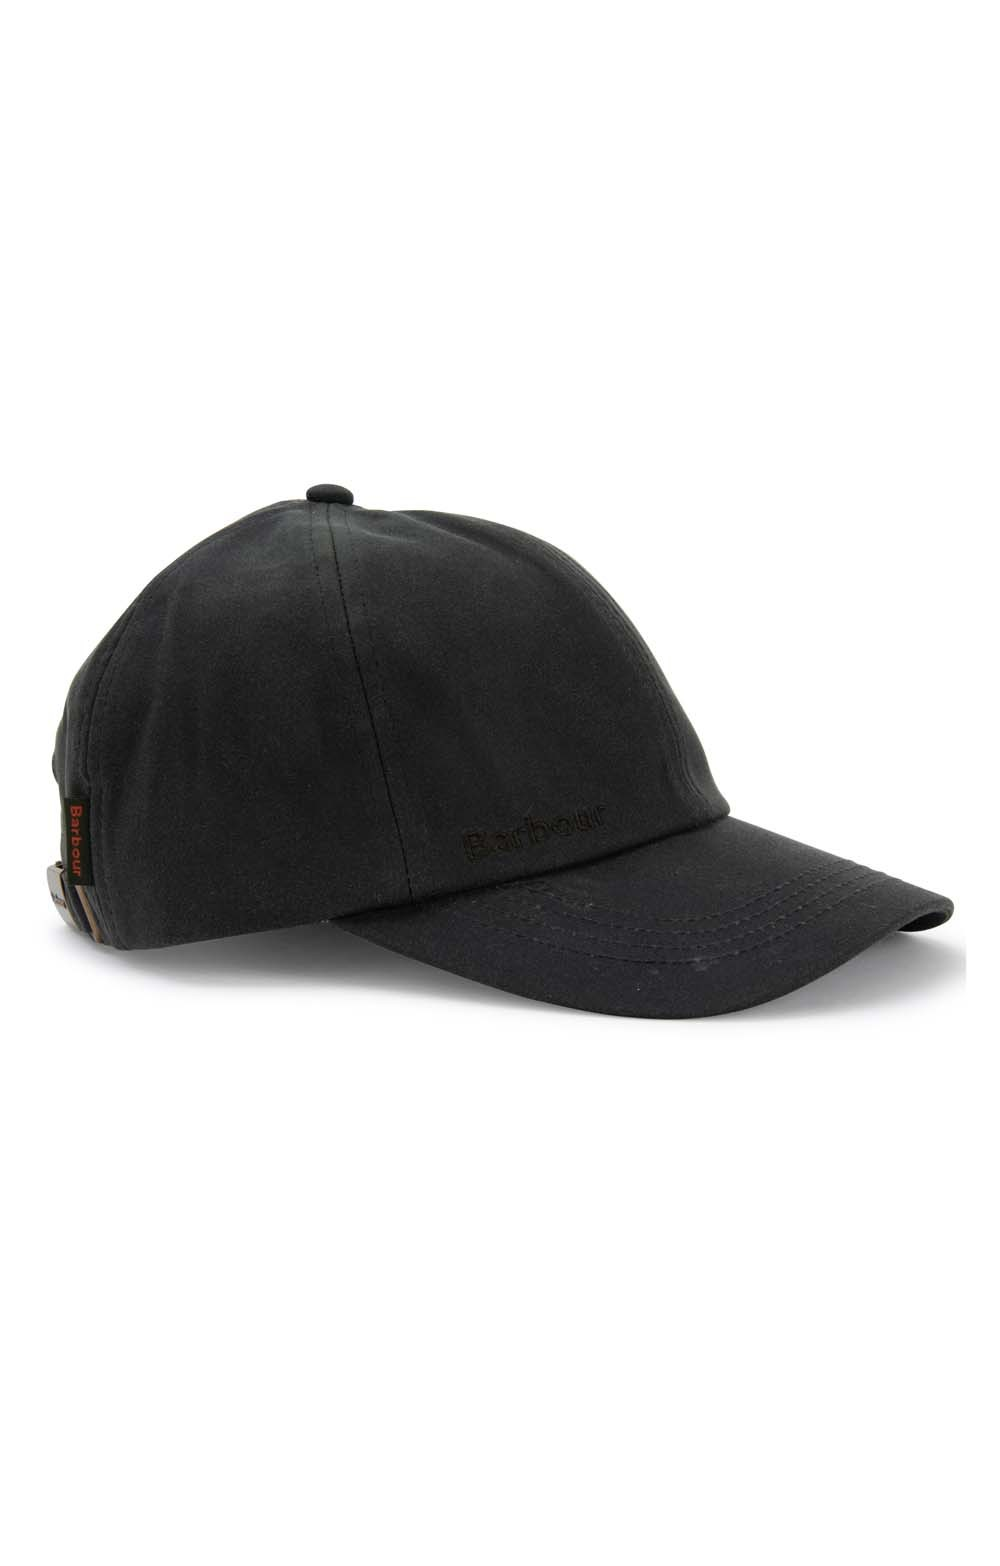 Barbour Wax Sports Cap  13026e9d03b